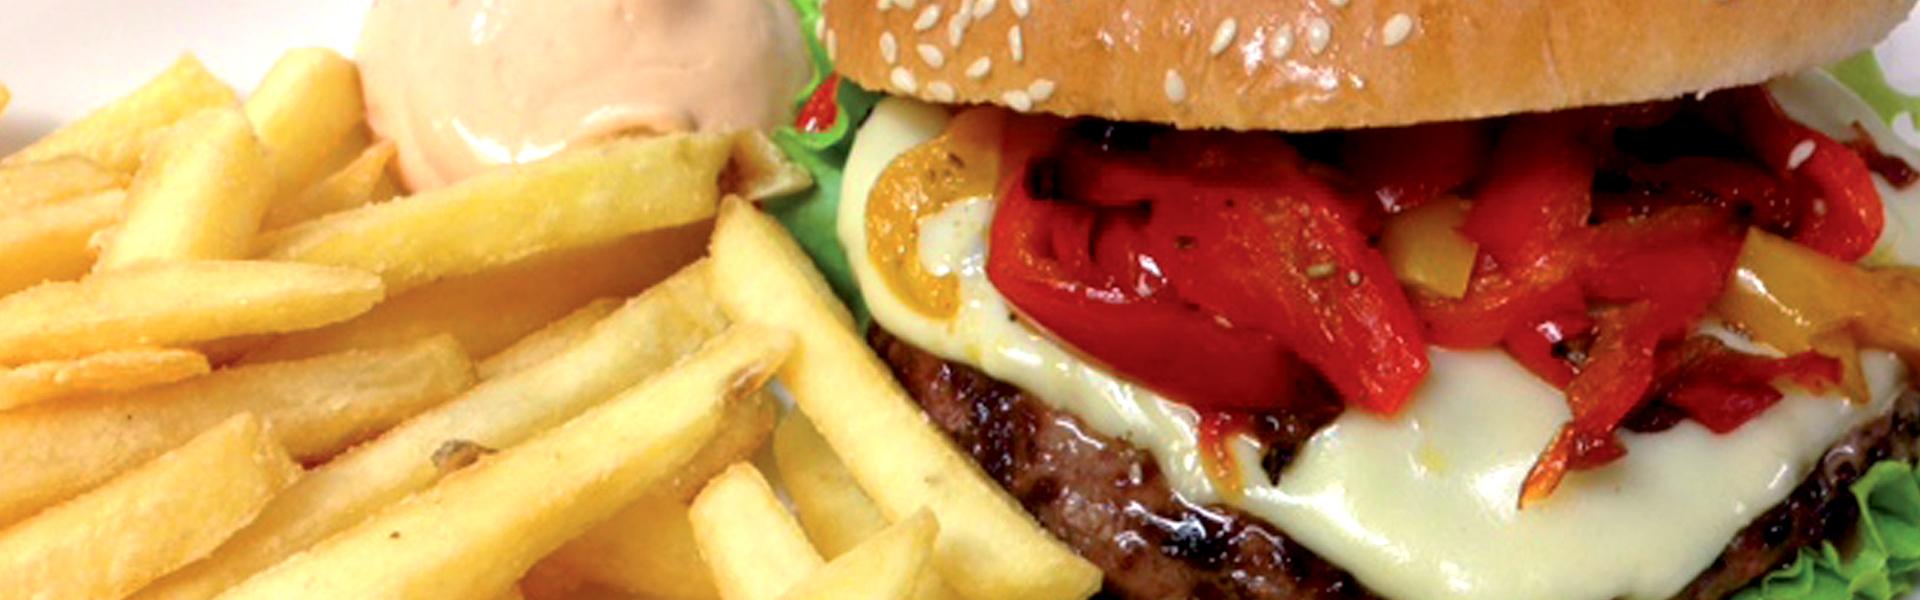 slider_hamburger_sandiego